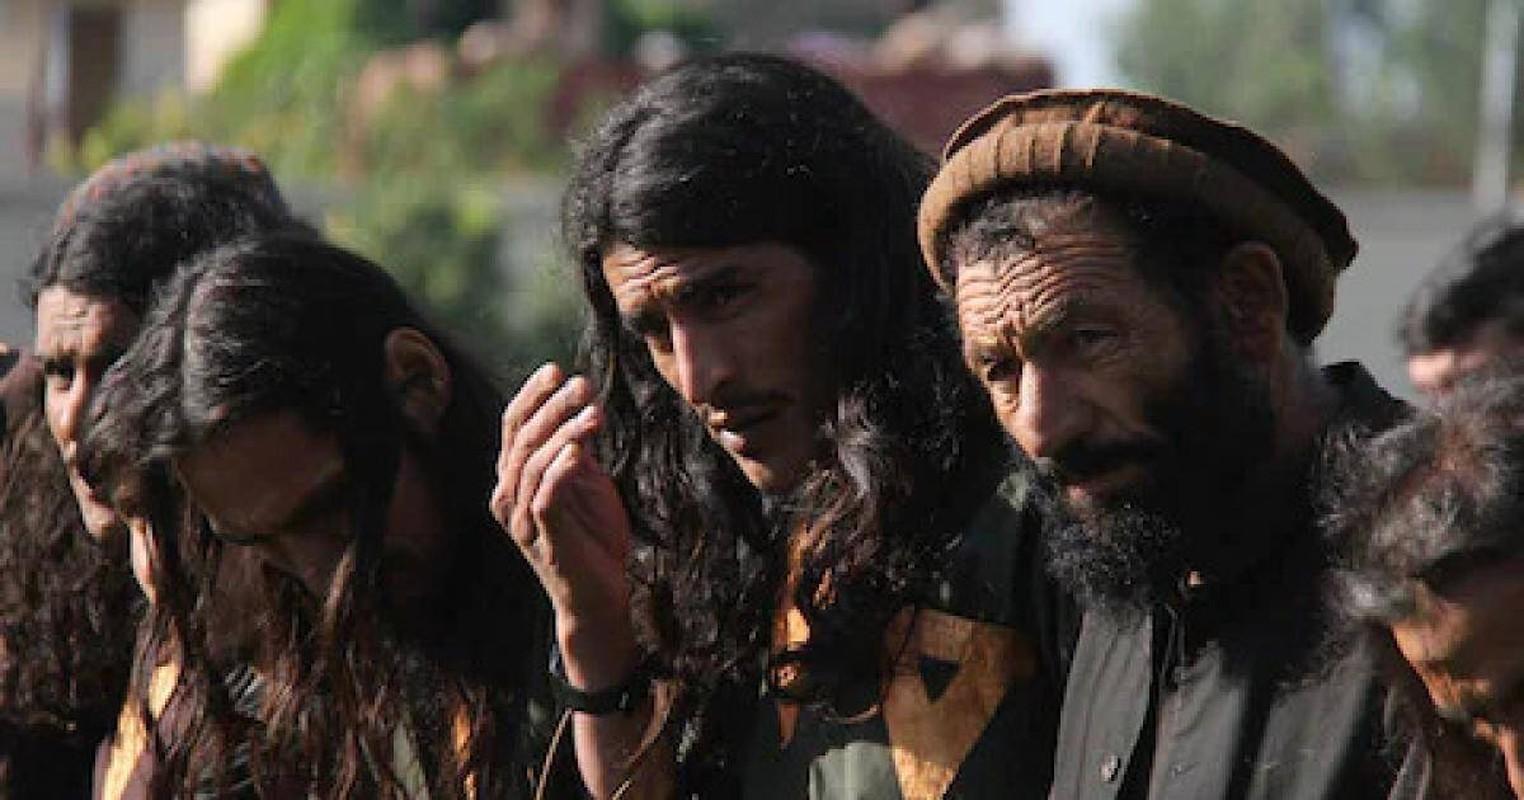 Gianh quyen kiem soat Afghanistan xong, Taliban tan cong ISIS-K-Hinh-7